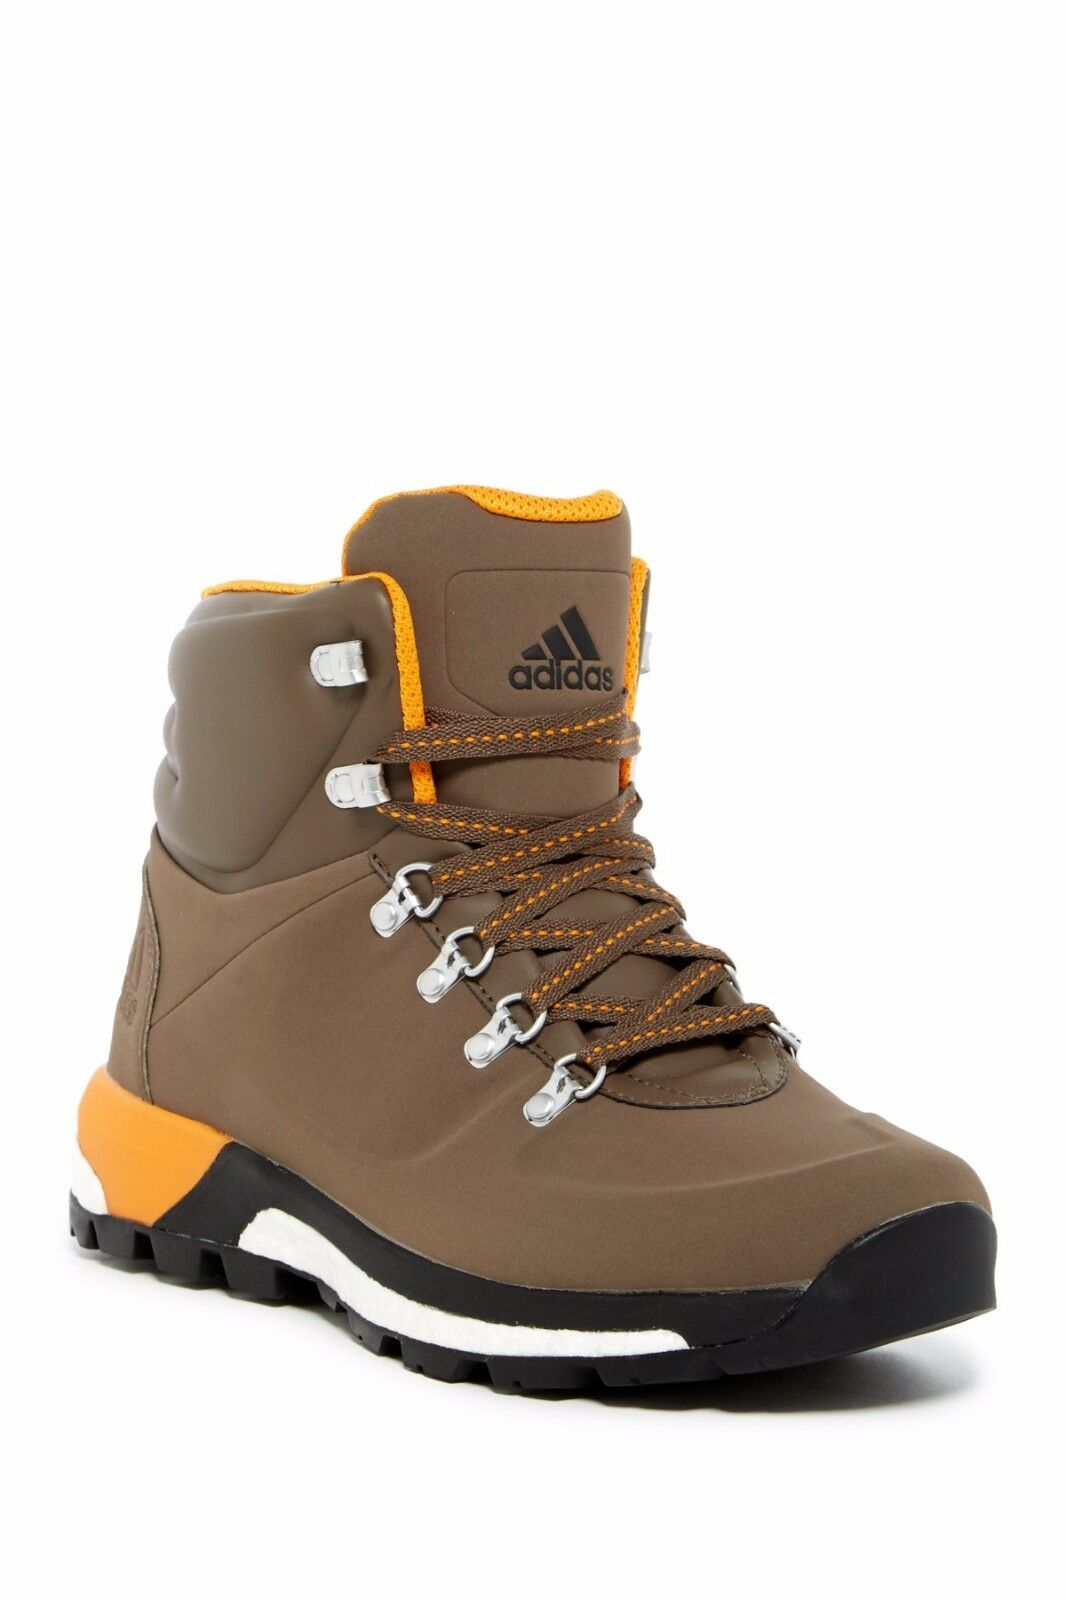 Adidas impulso cw pathmaker impulso Adidas primaloft stivali uomini nuovi w / o box!!!! 0f6daf